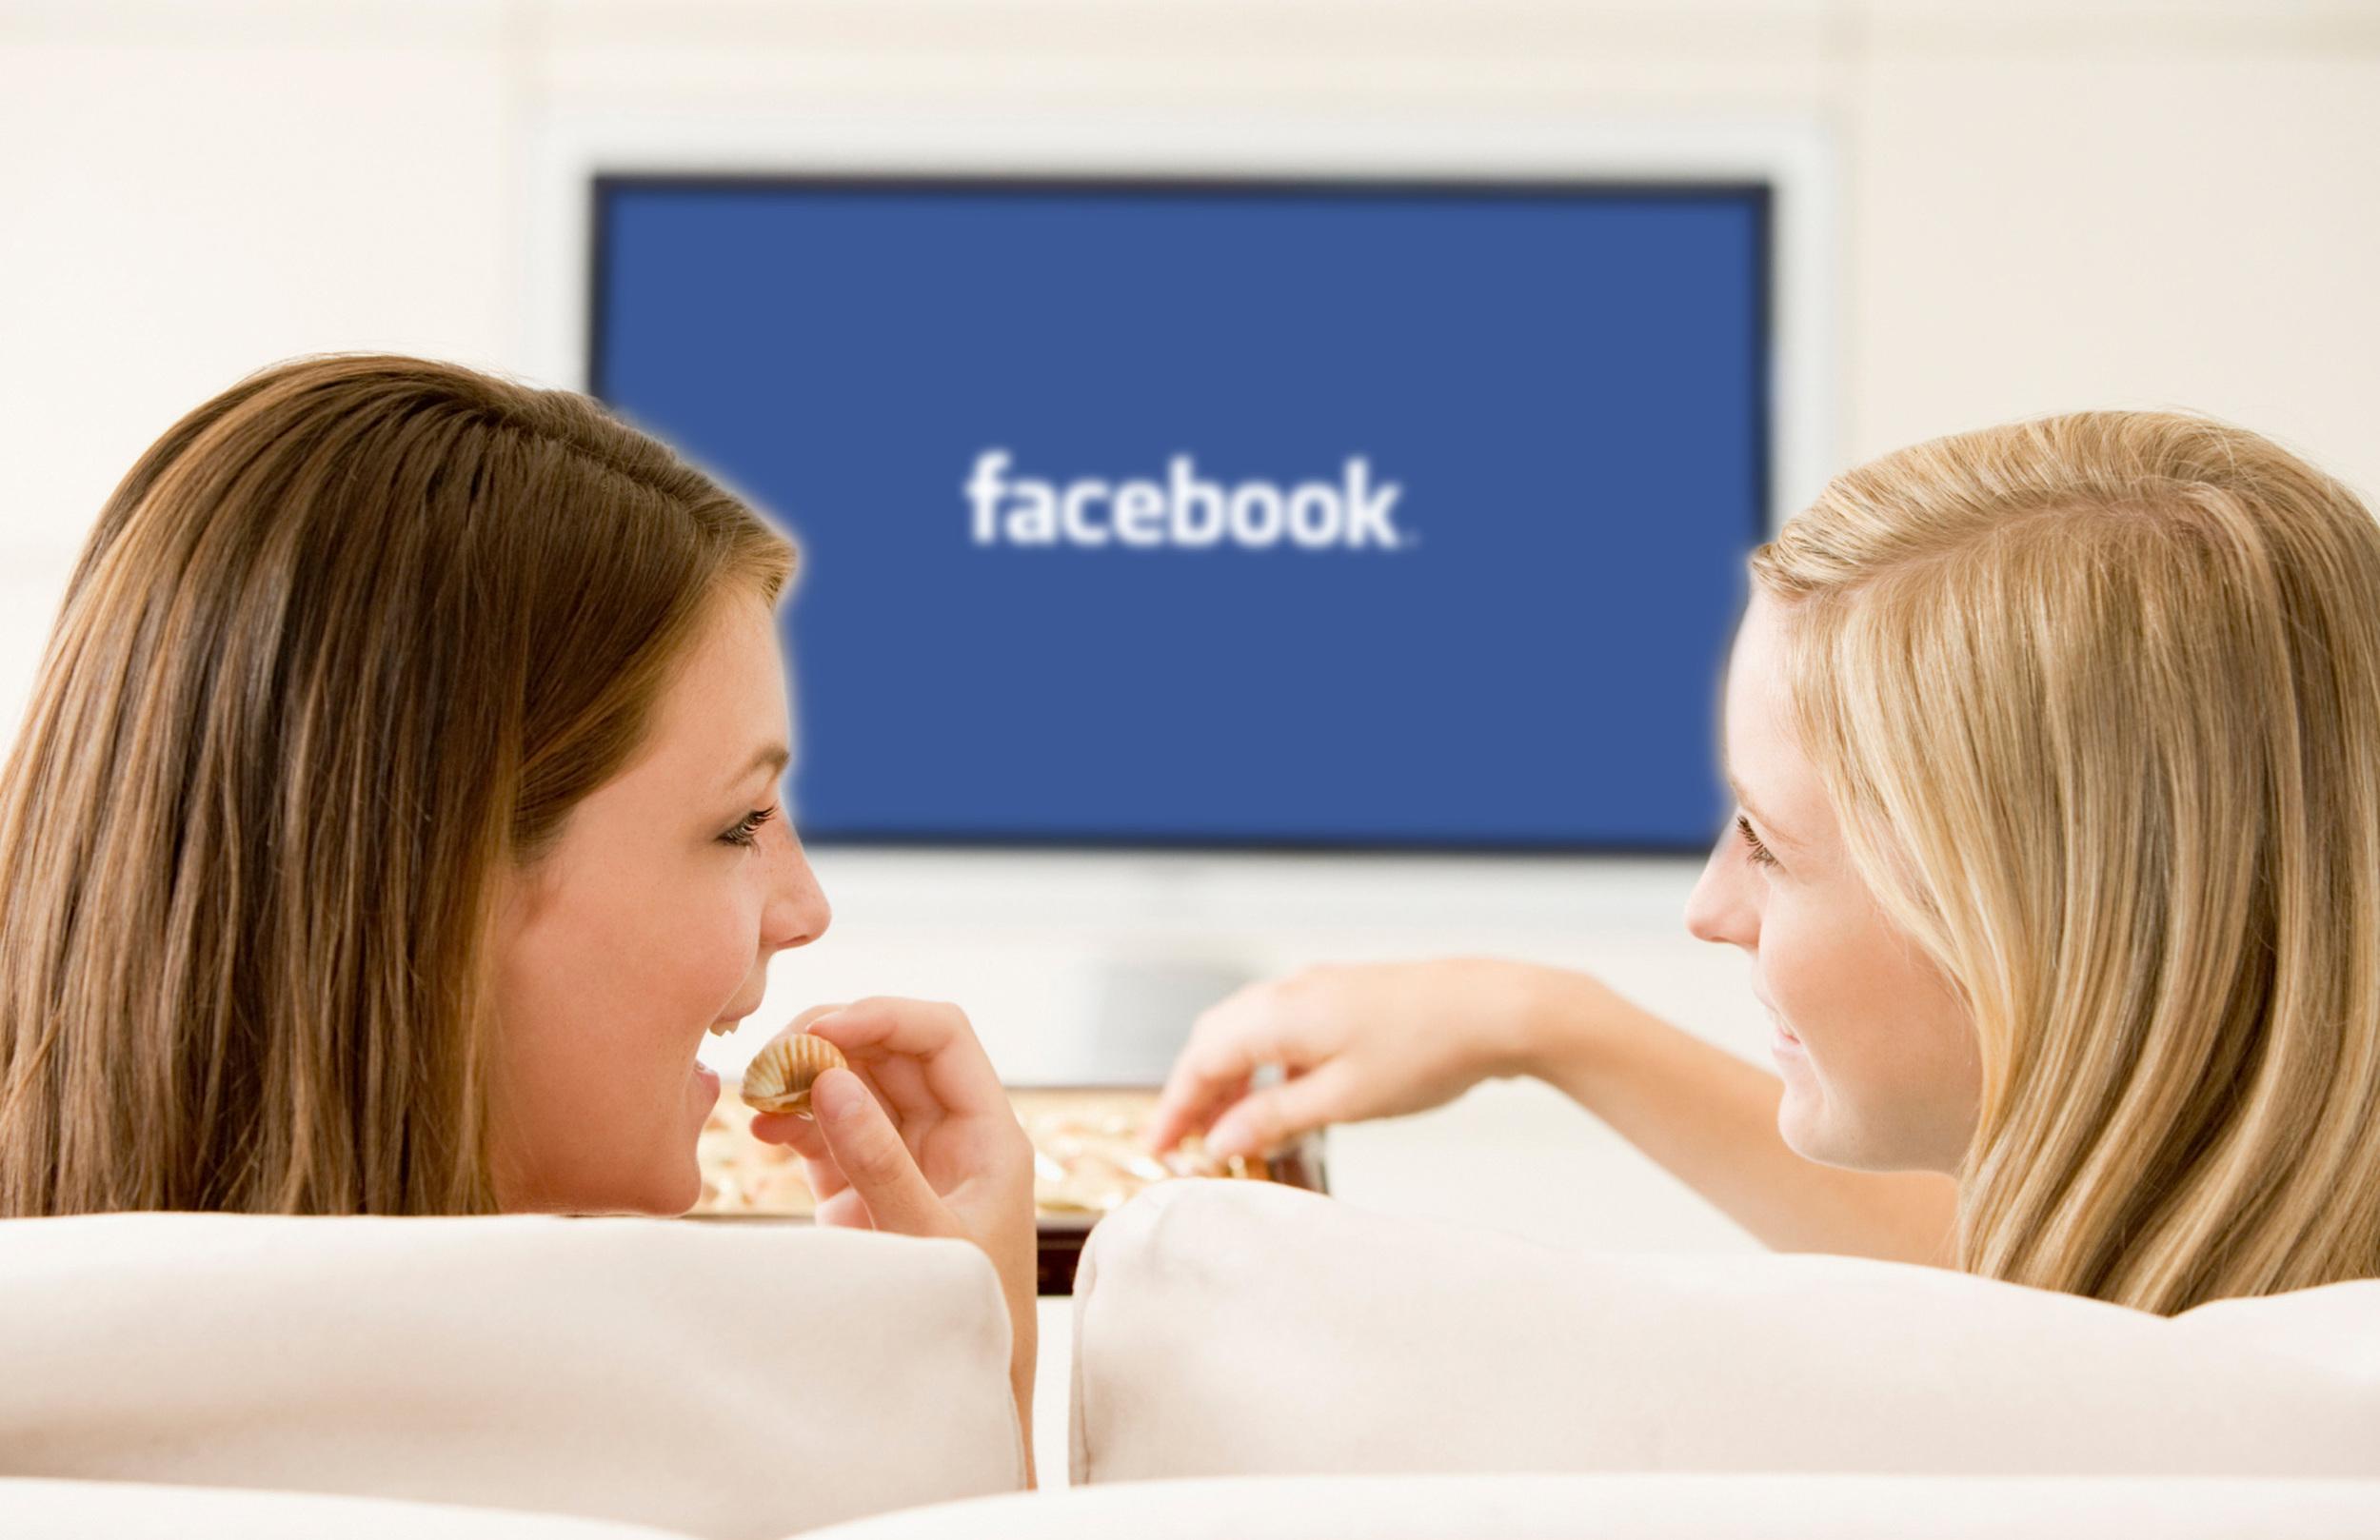 FB_Entertainment_0001_Layer Comp 2.jpg